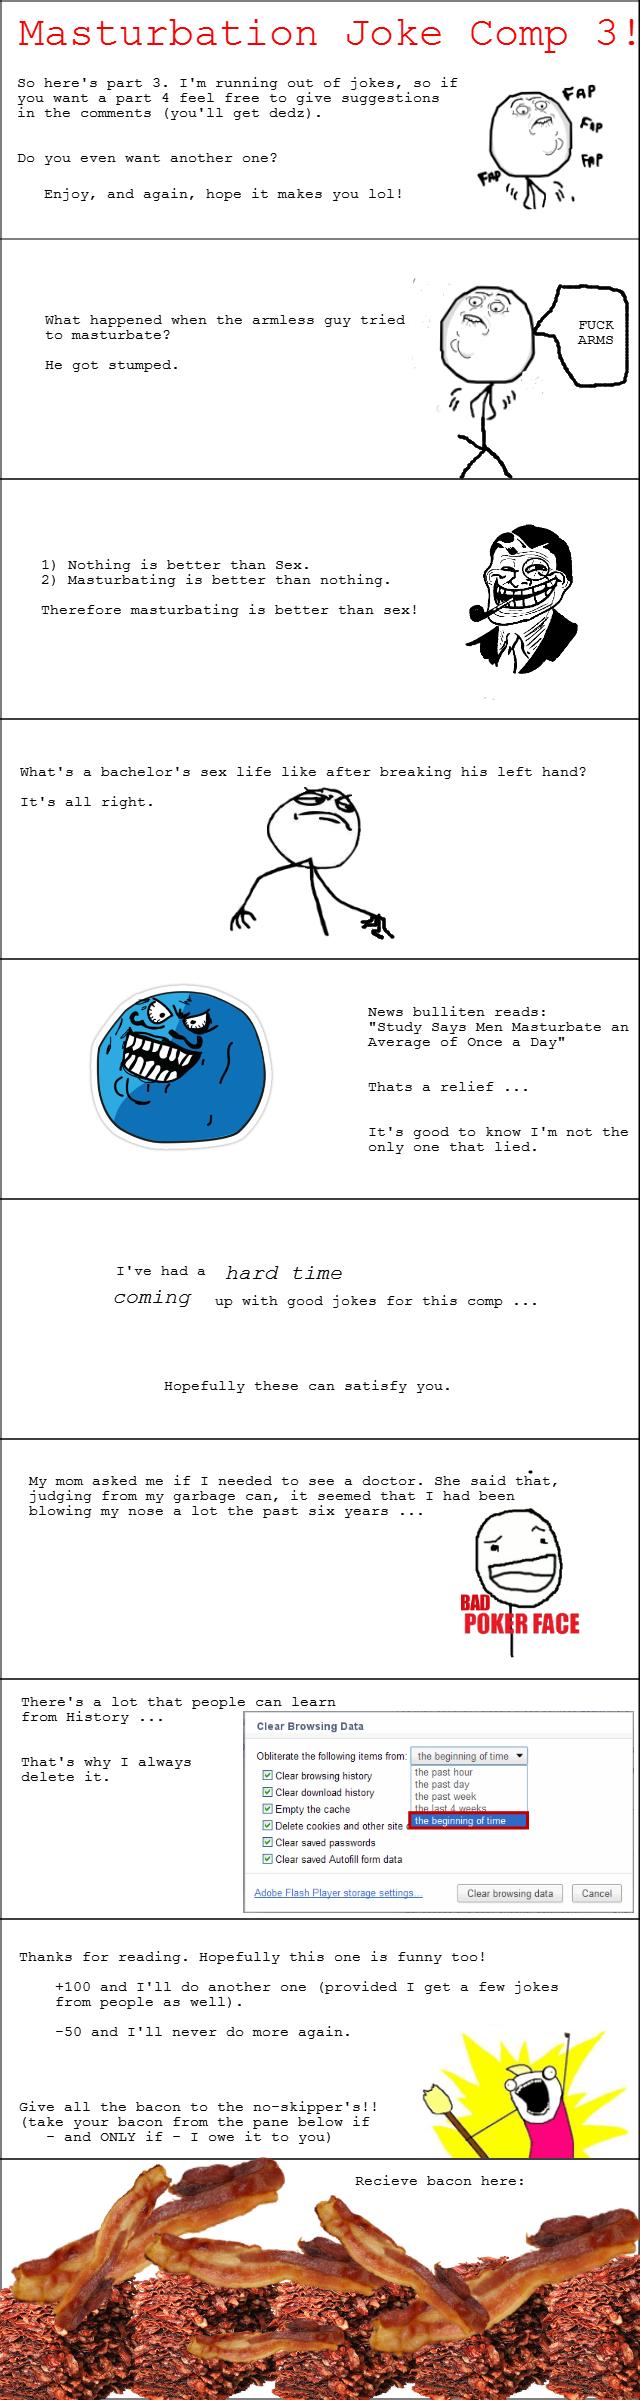 Masturbation Joke Comp 3. Part 2: funnyjunk.com/funny_pictures/3218317/Masturbation+Joke+Comp+2/ Part 1: funnyjunk.com/funny_pictures/3214064/Masturbation+Joke+